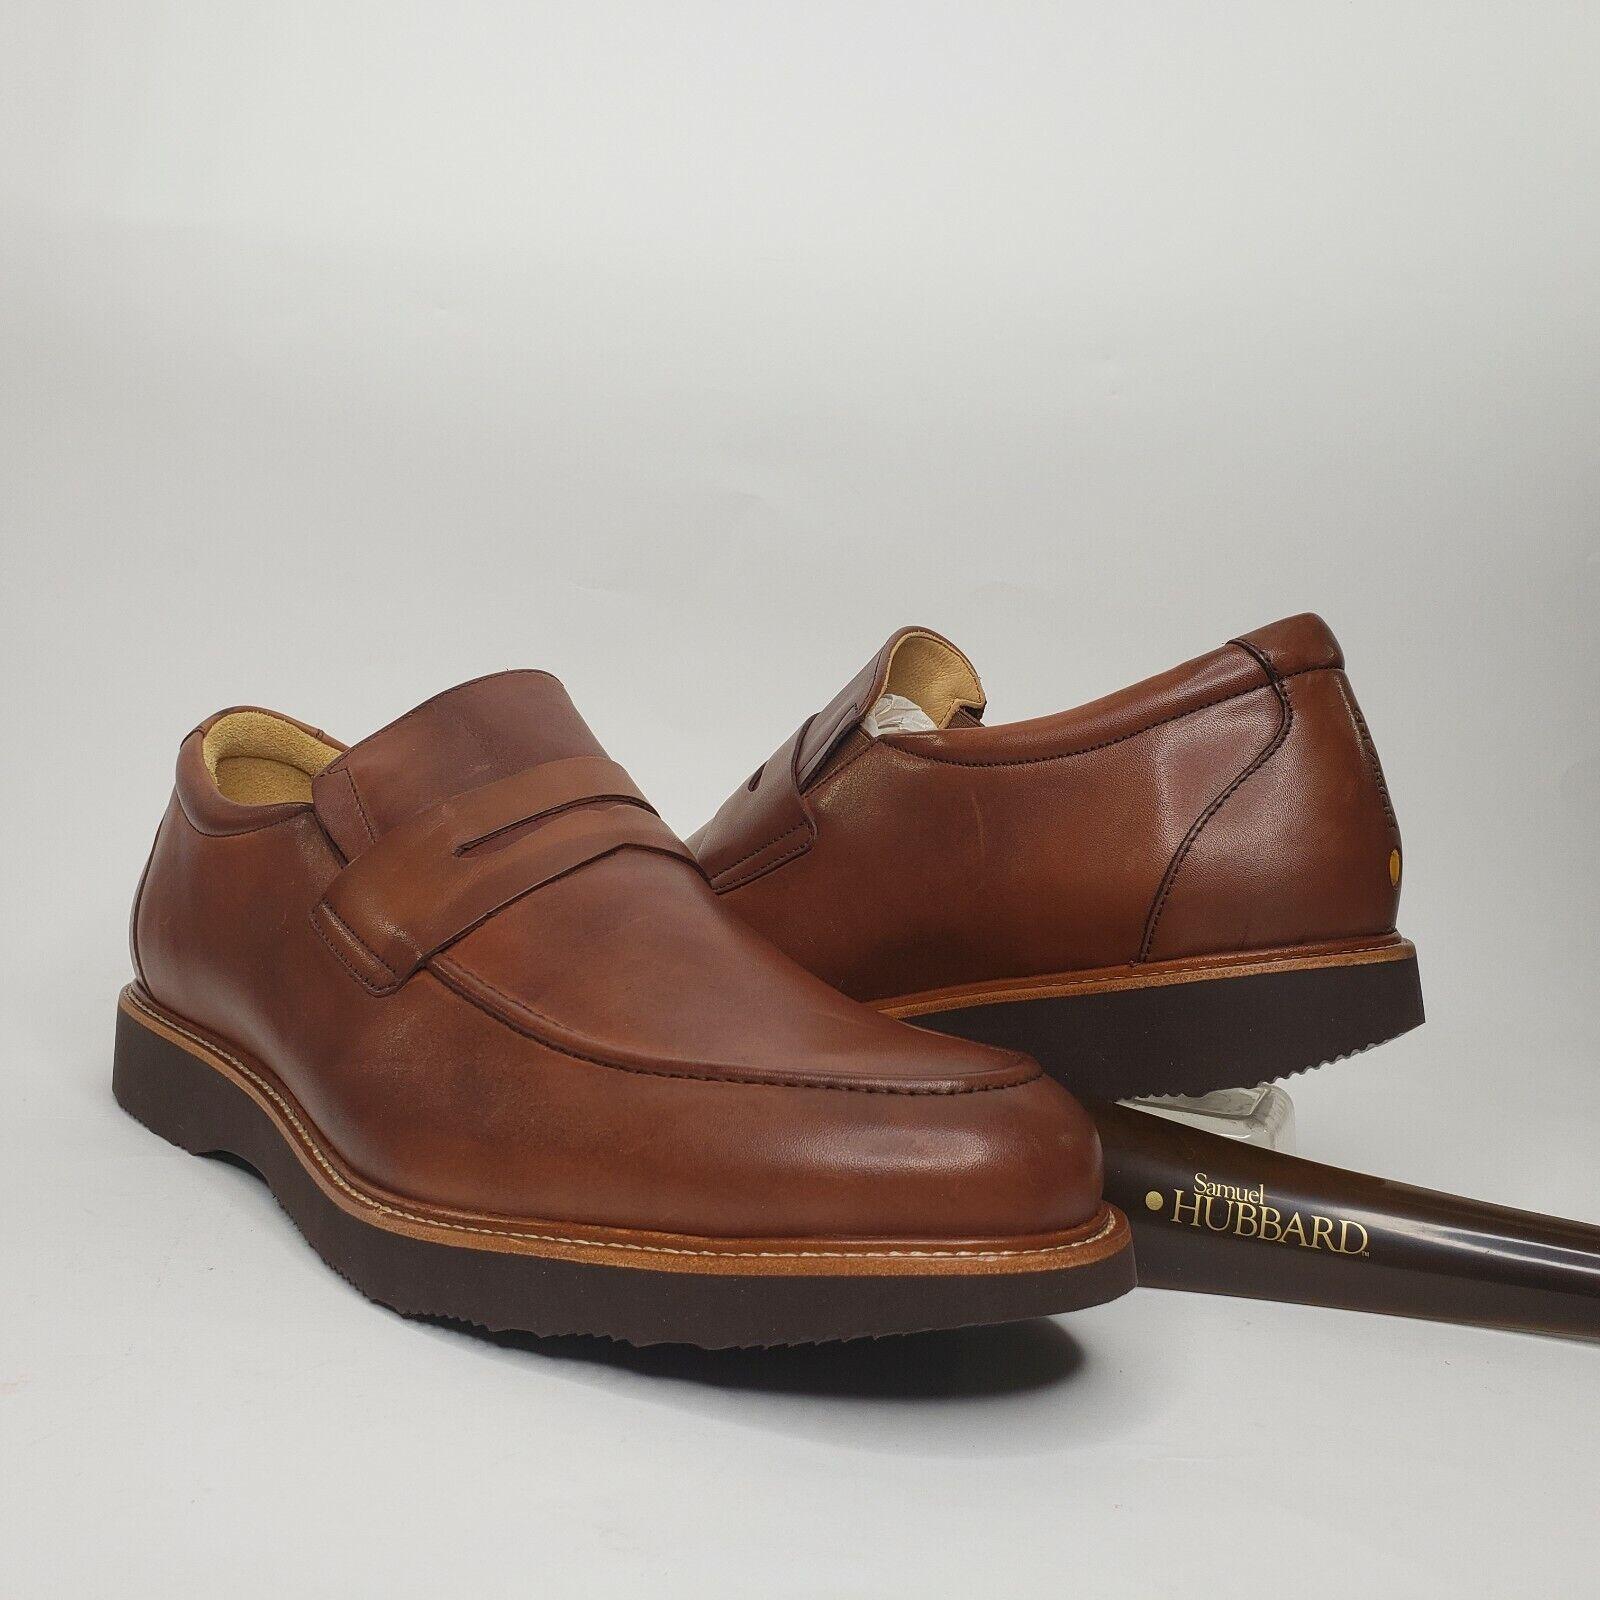 Samuel Hubbard Ivy Legend Whiskey Leather Slip-on Dress Shoes Size 13M M2180-065